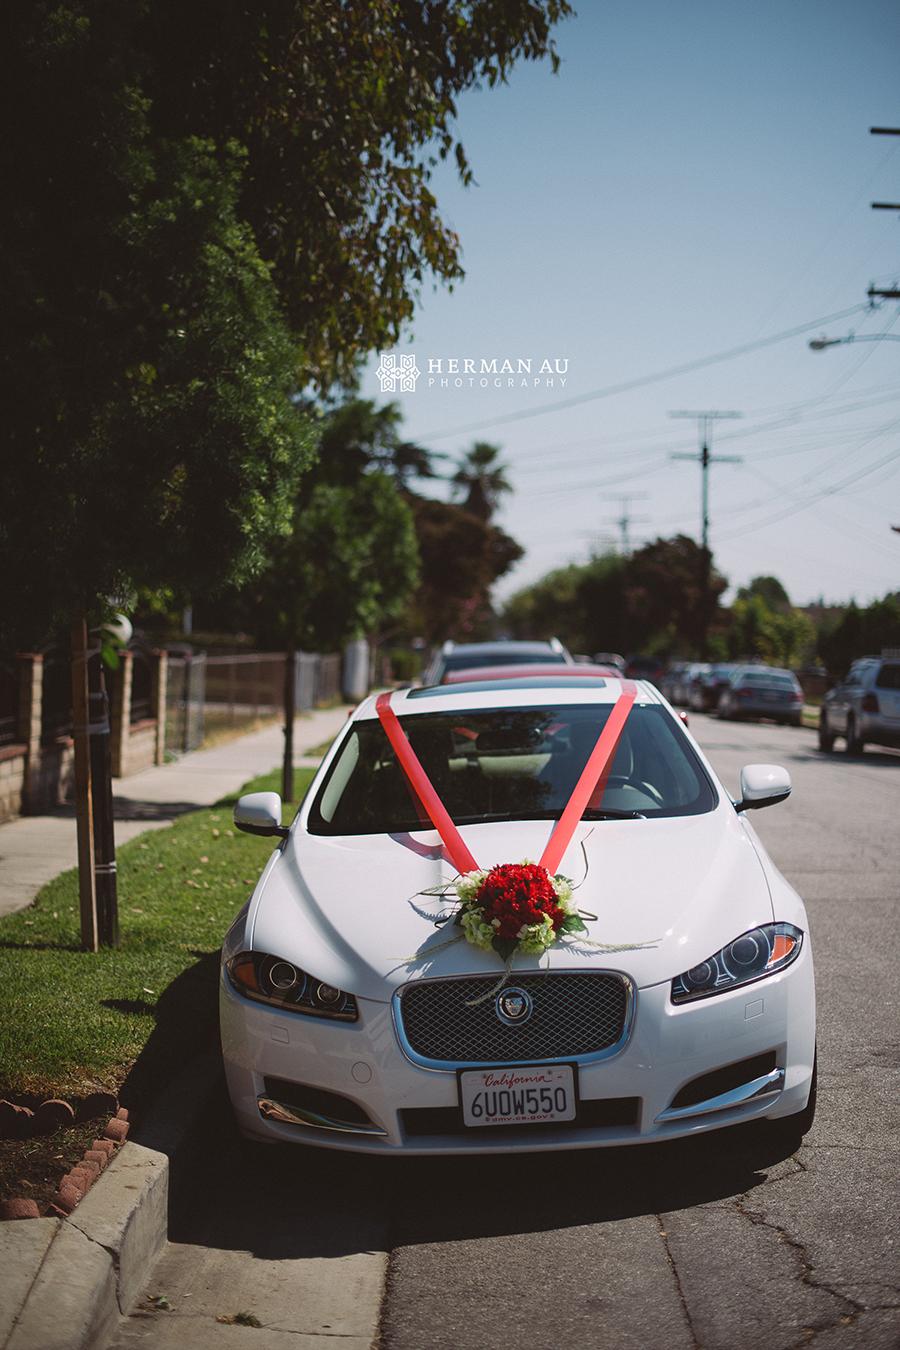 02.wedding vehicle jaguar